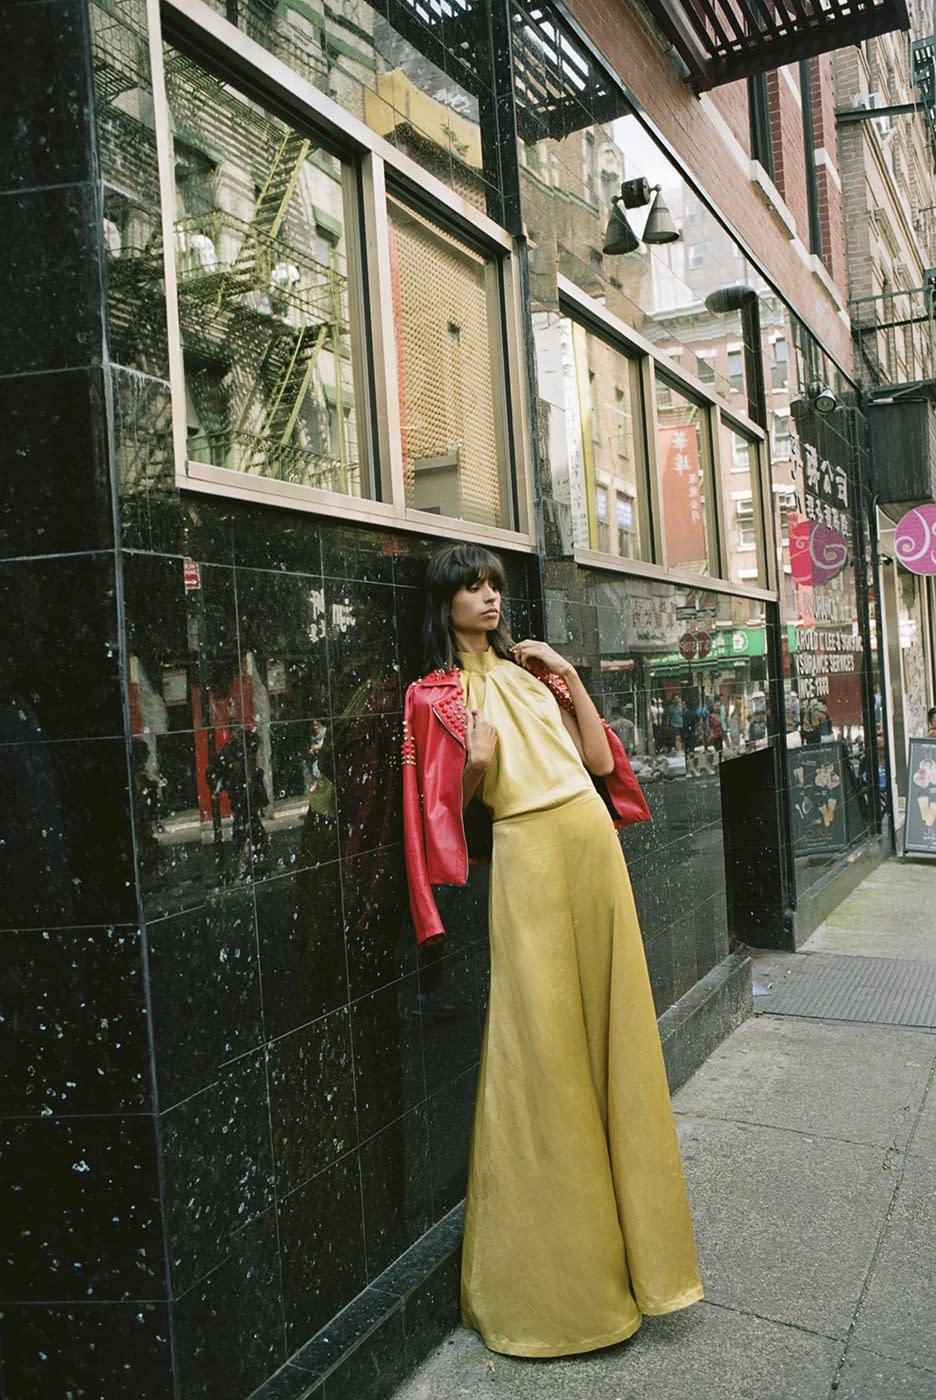 New York Stories 1 photo Enric Galceran - 16